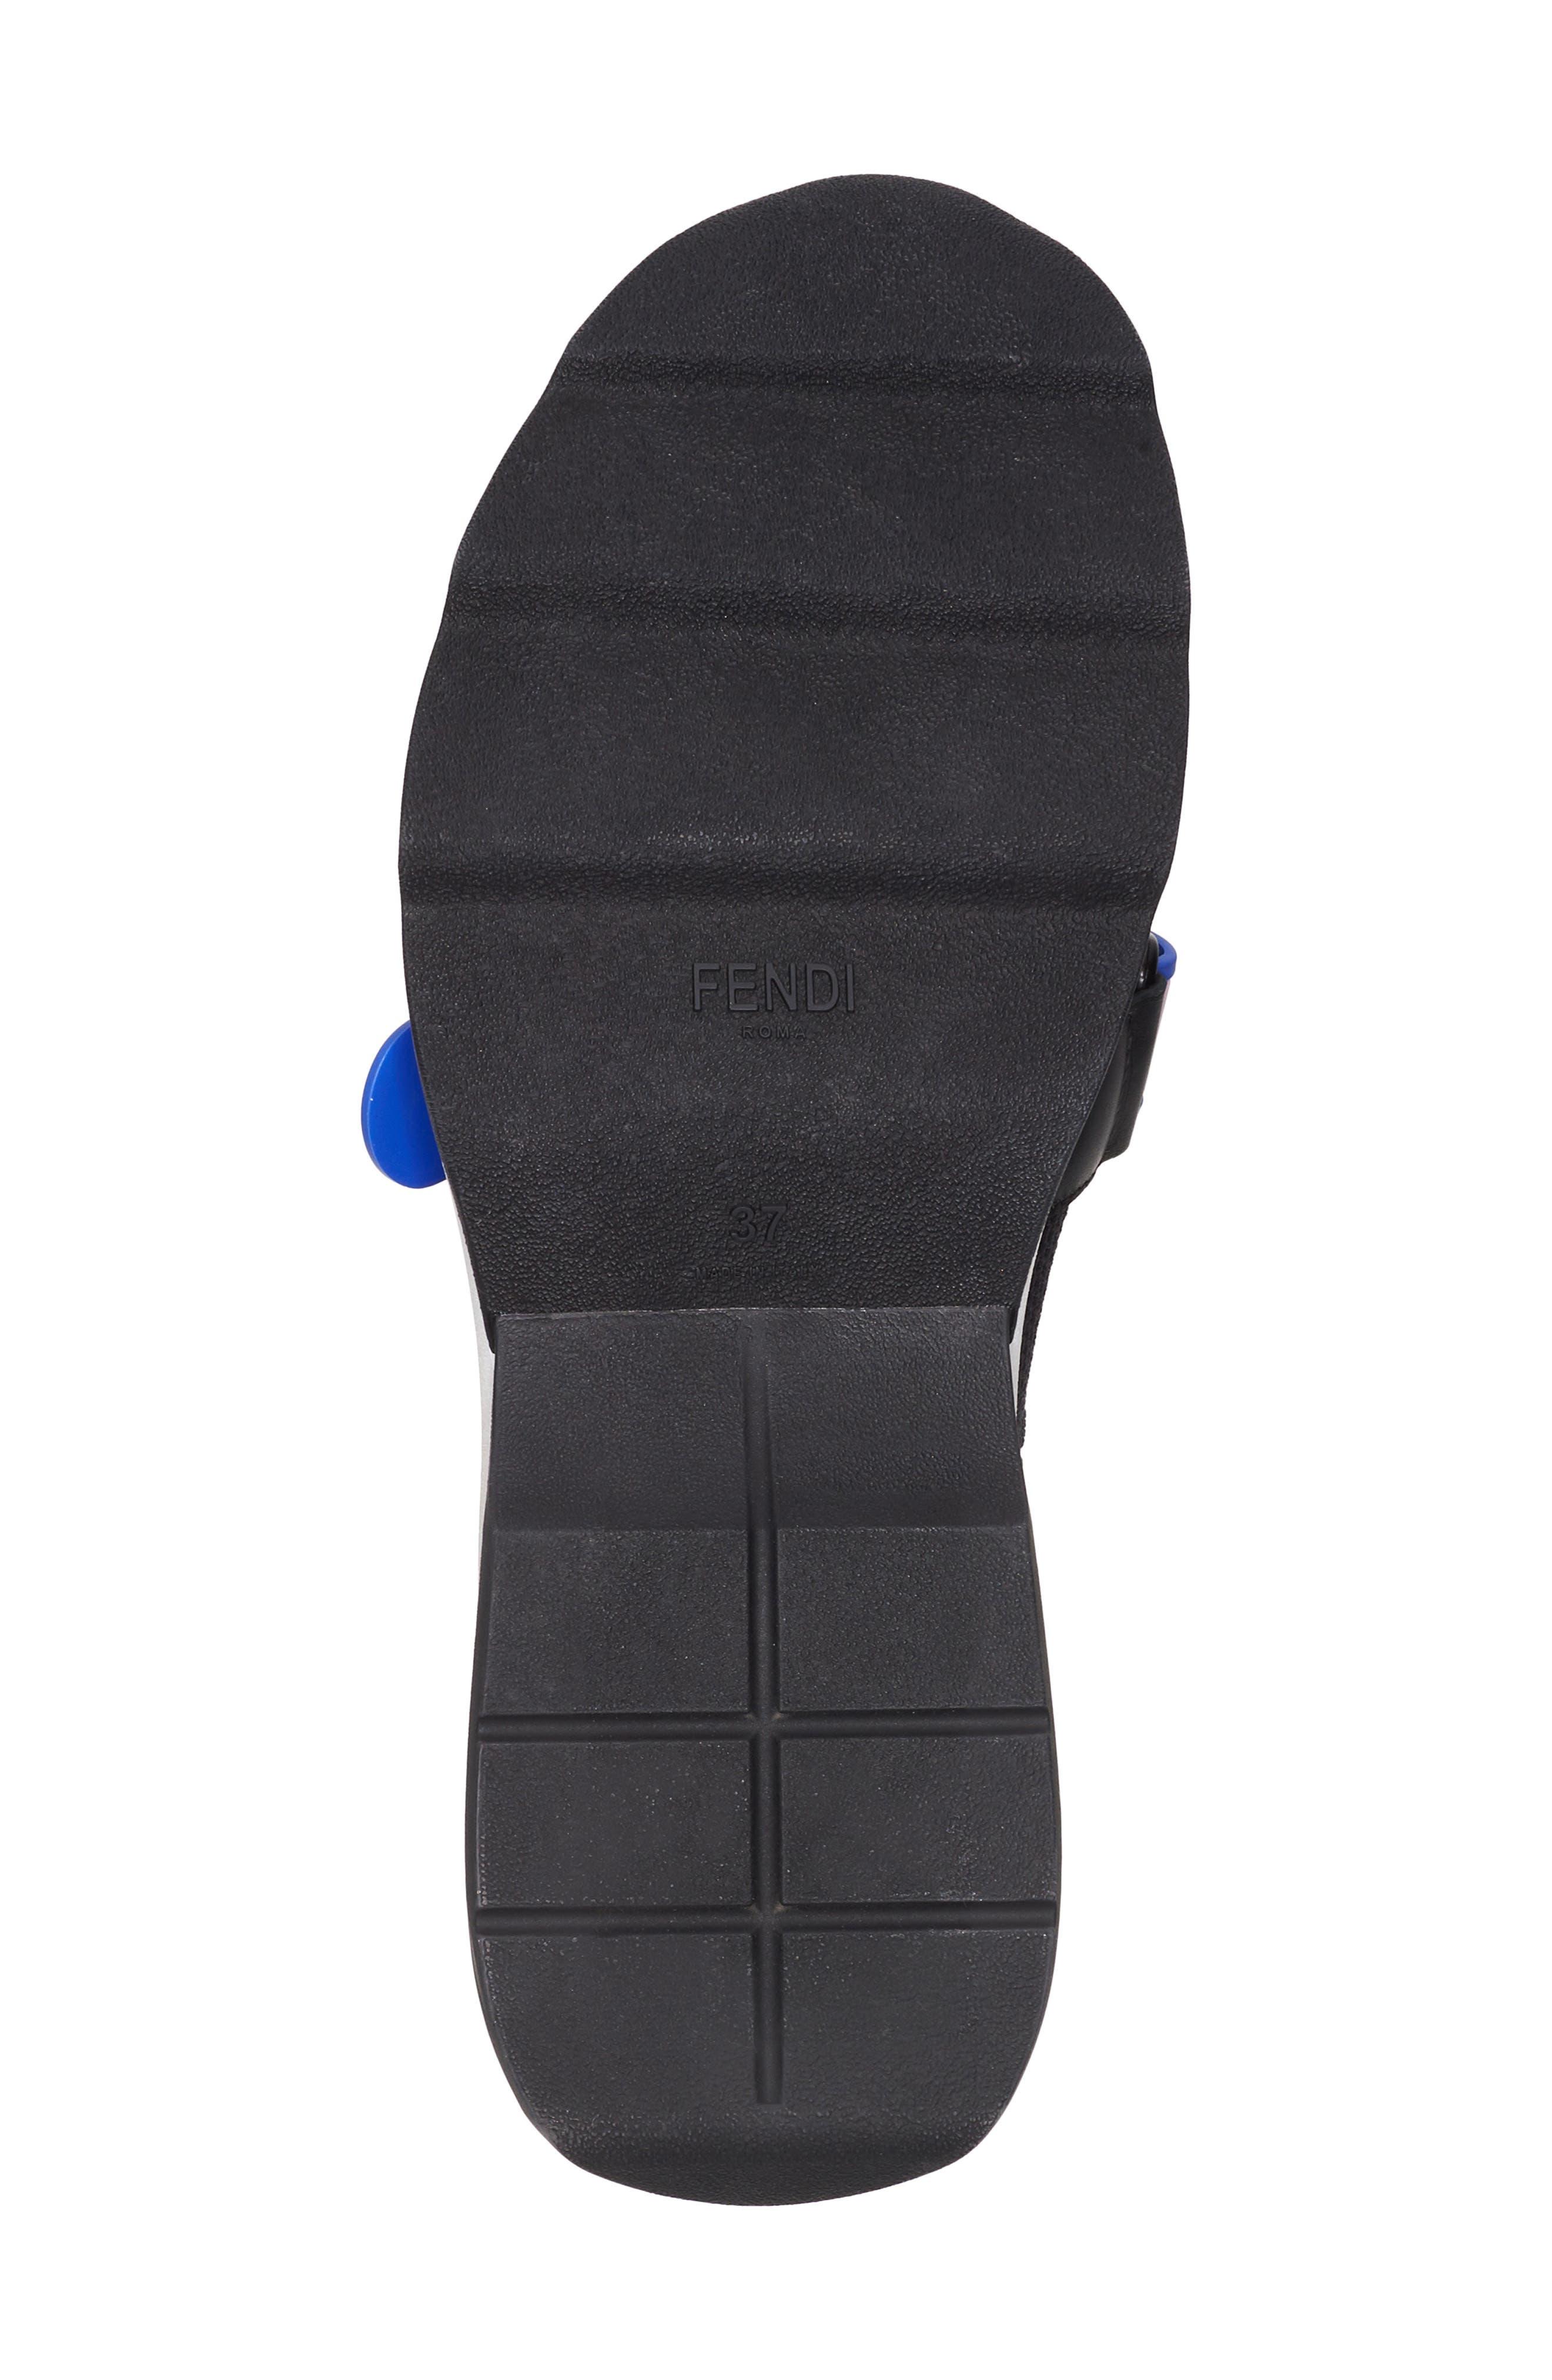 Rockoko Mismatch Sneaker,                             Alternate thumbnail 6, color,                             Black